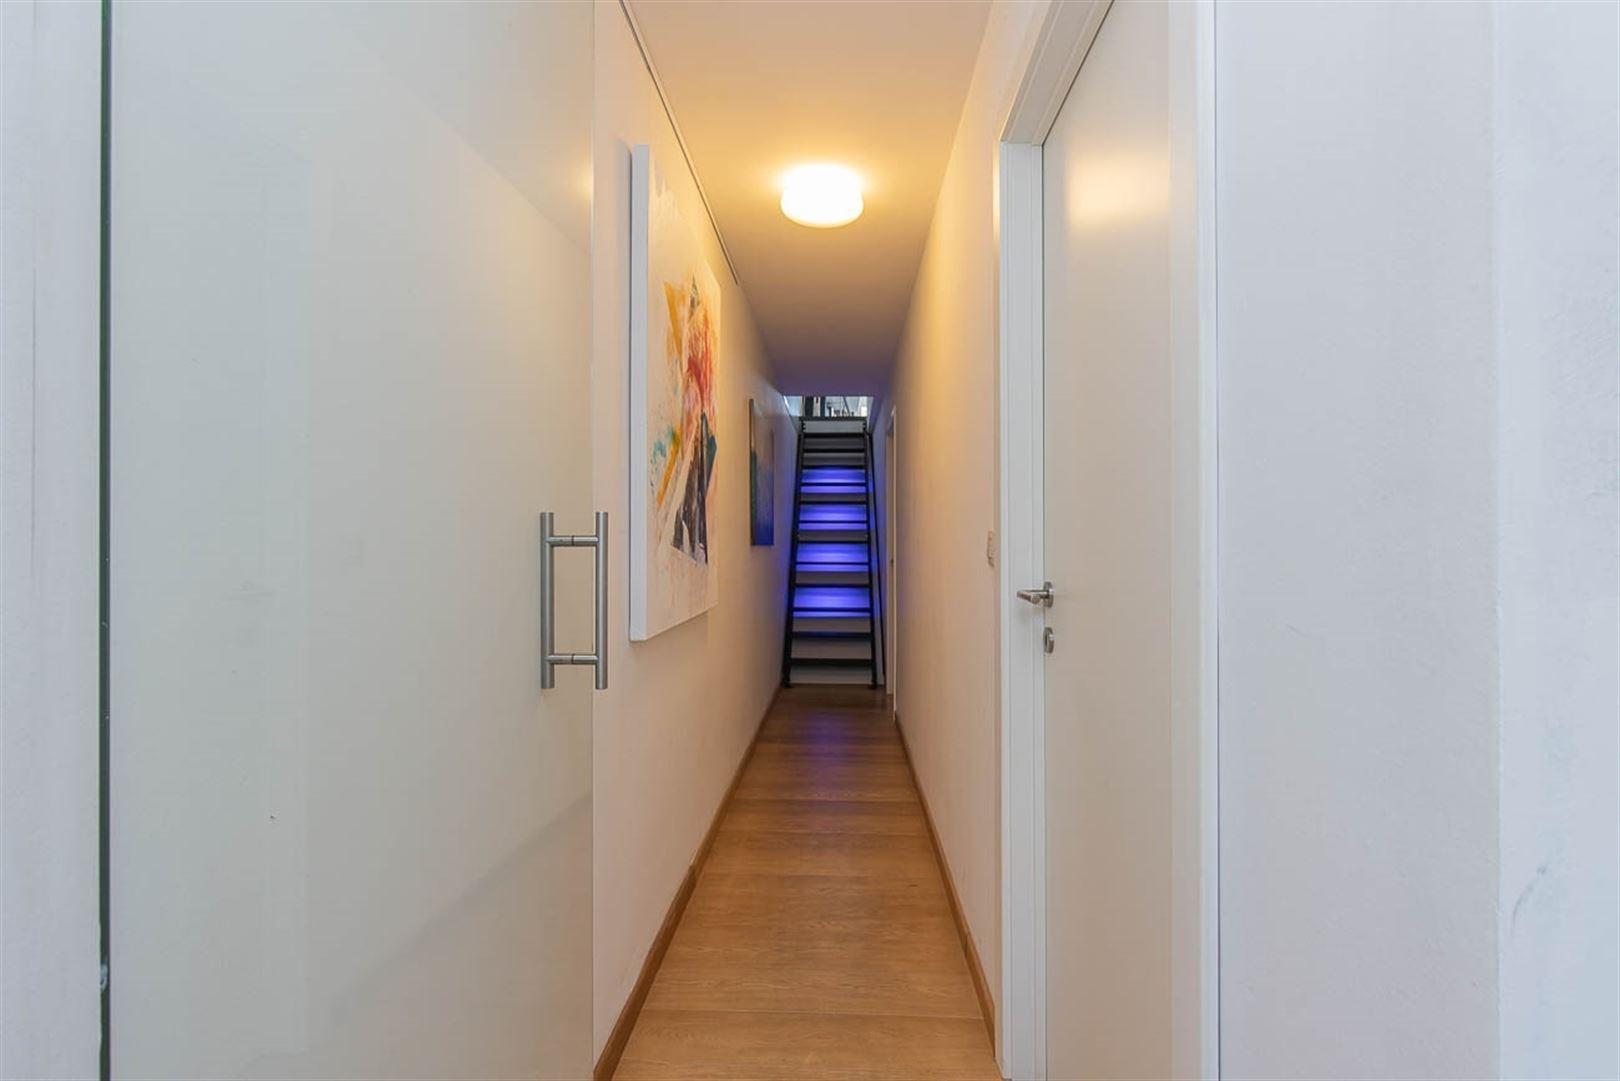 Foto 26 : Woning te 9200 DENDERMONDE (België) - Prijs € 495.000